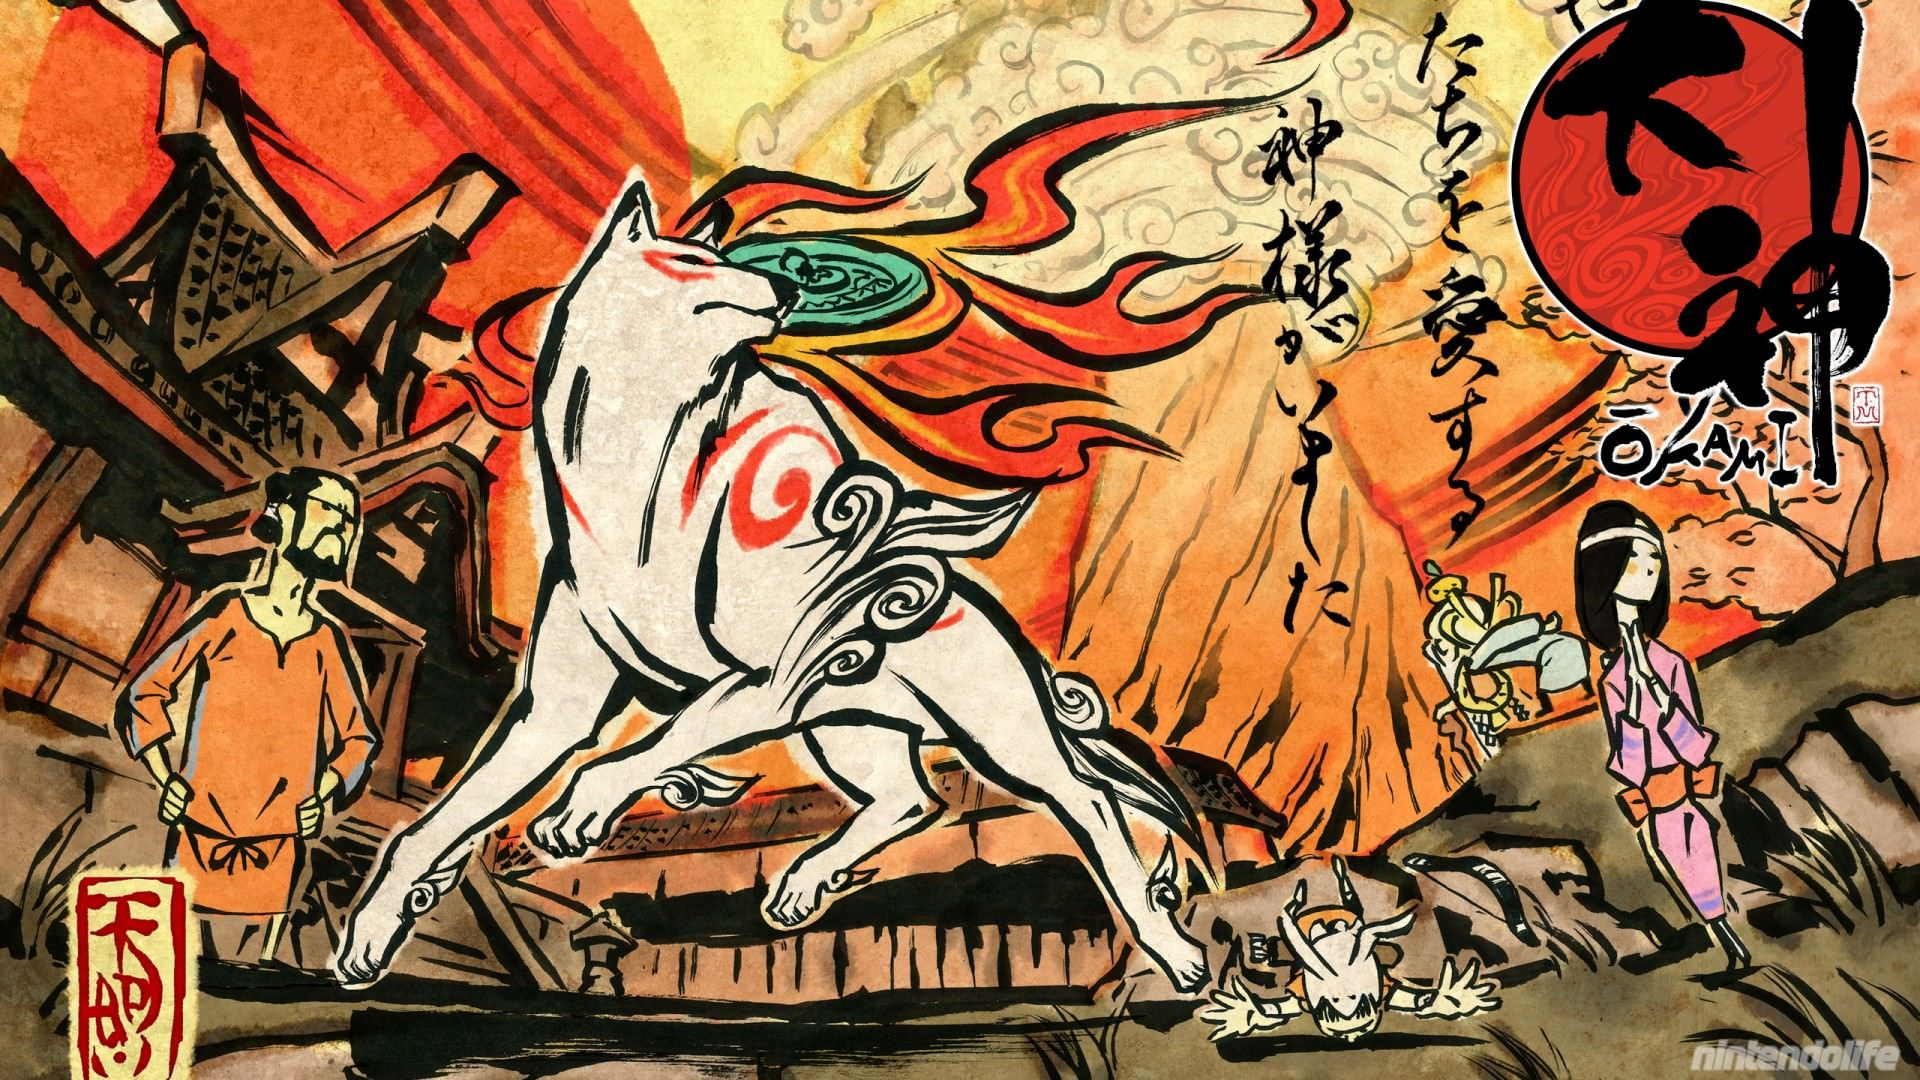 High Definition Mobile Phone And Desktop Wallpapers Okami Japanese Art Art